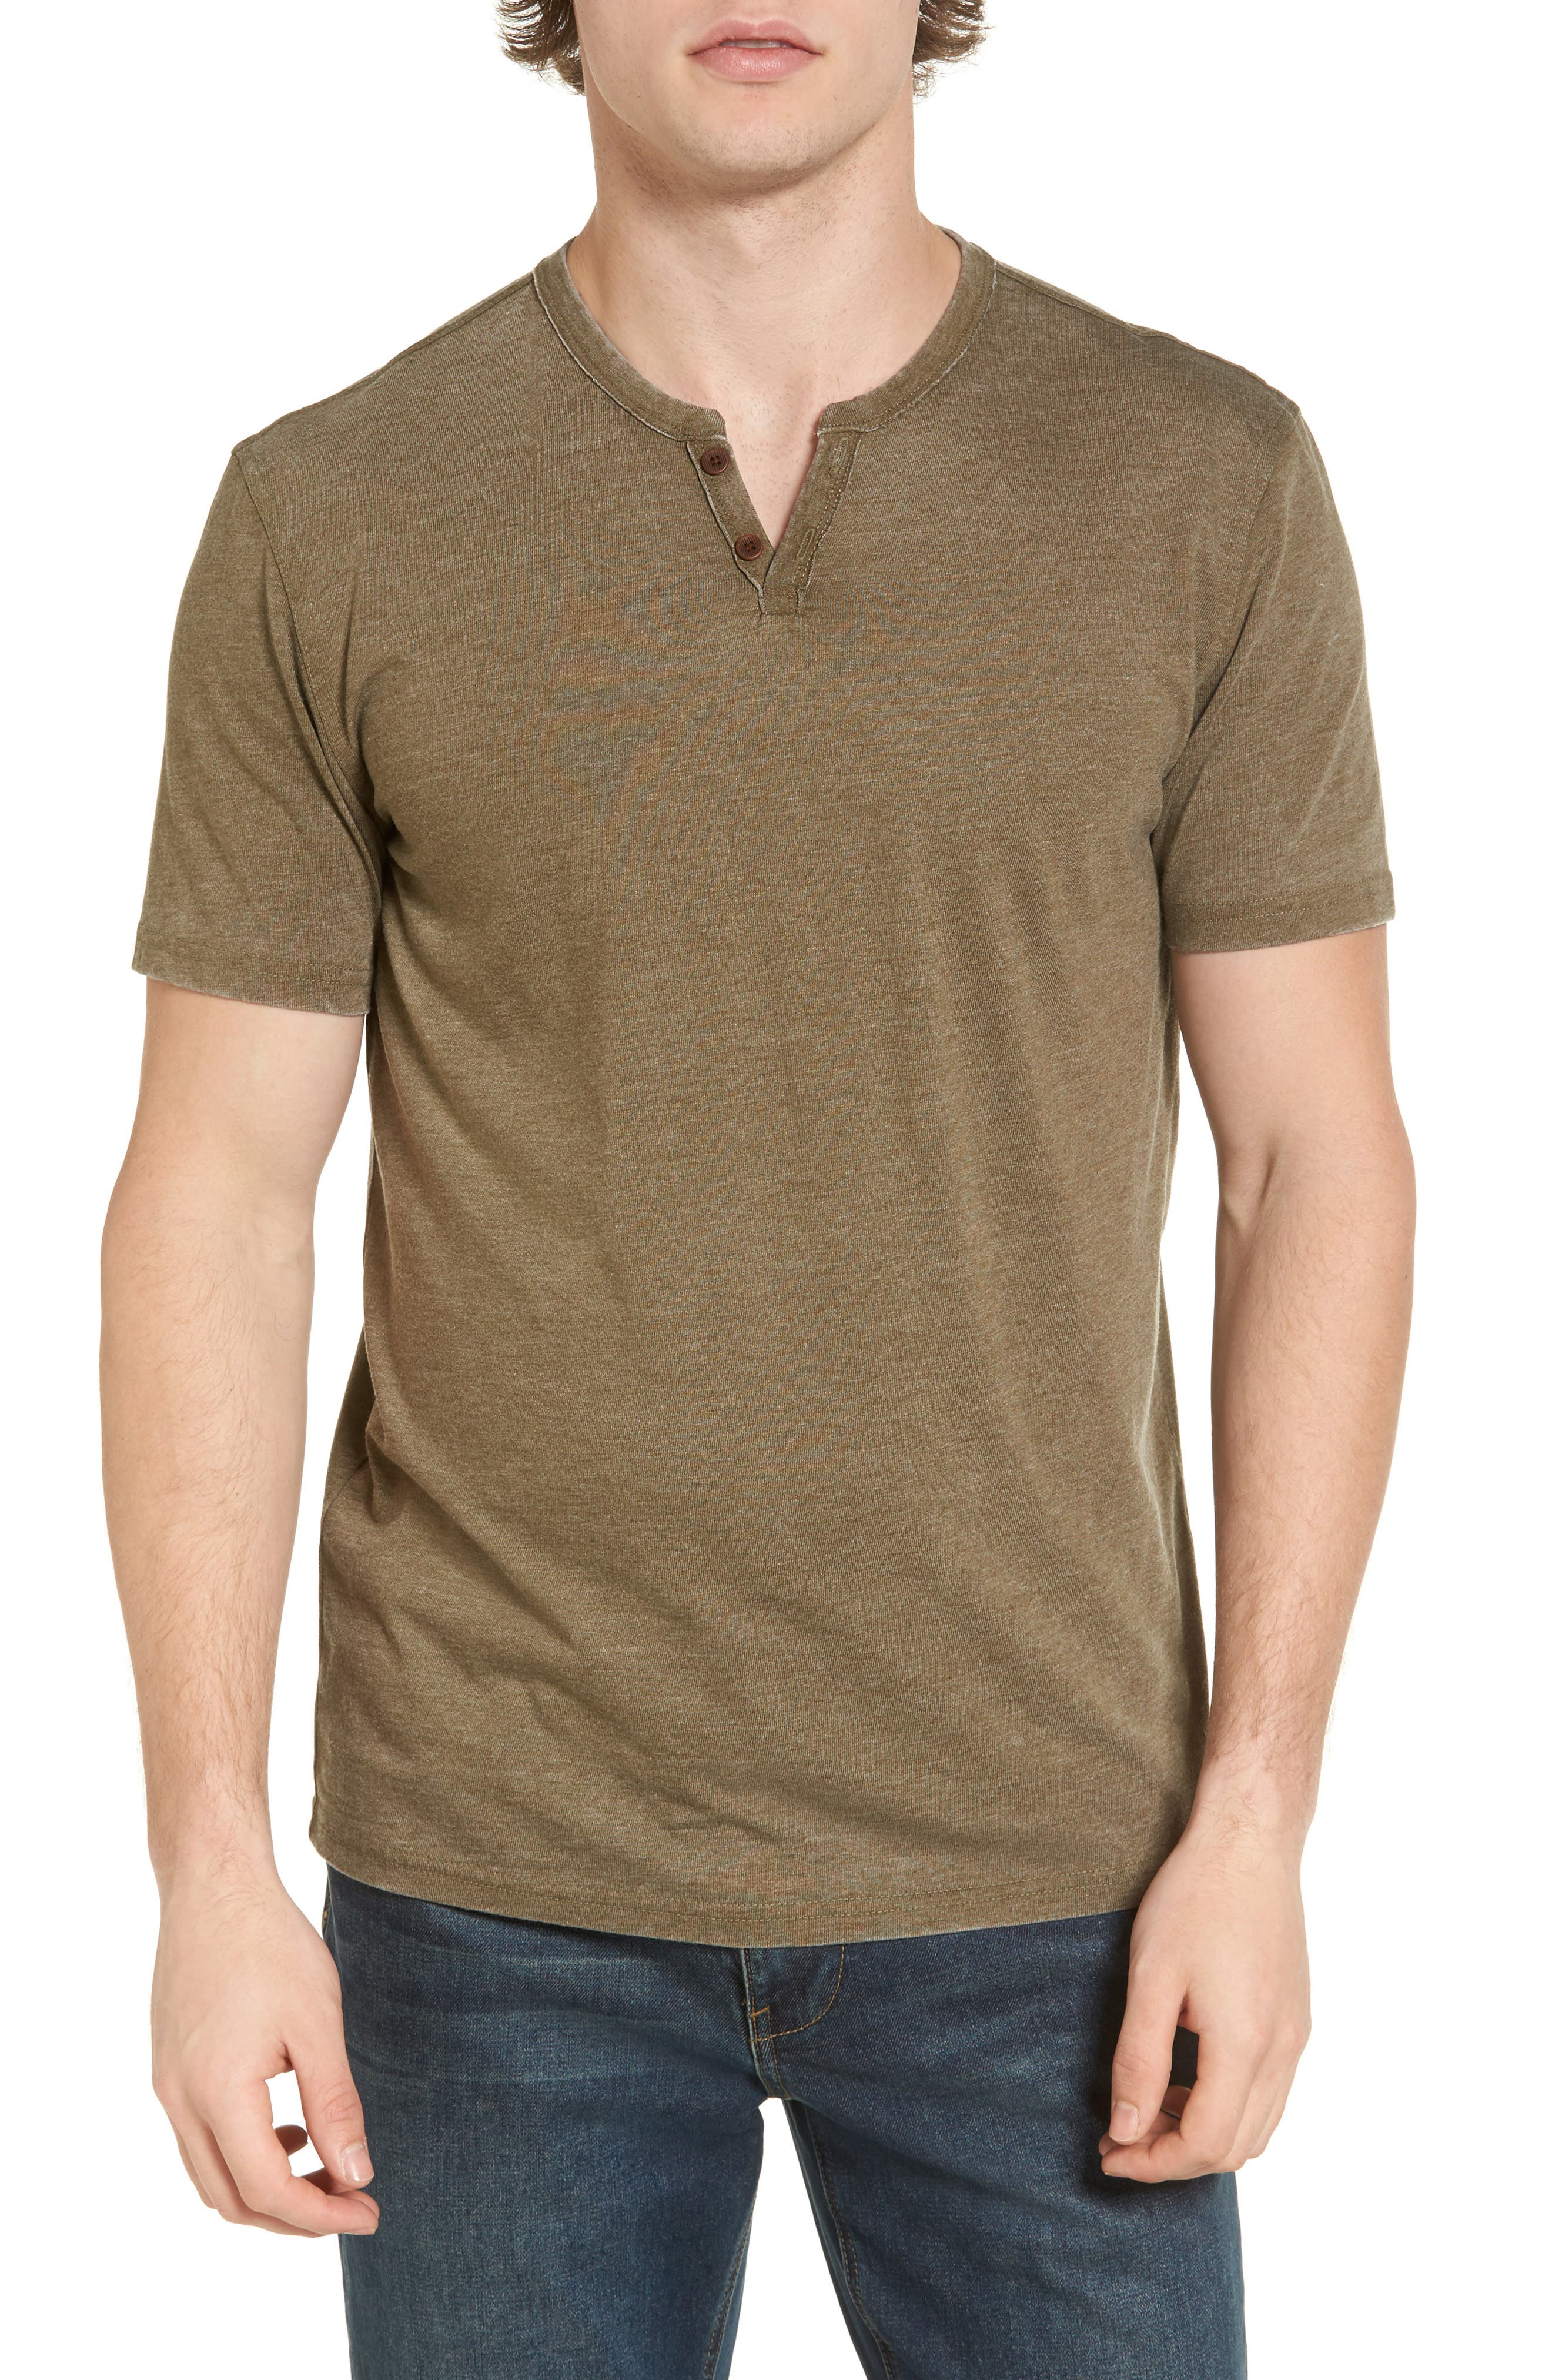 Lucky Brand Burnout Notch Neck T-Shirt